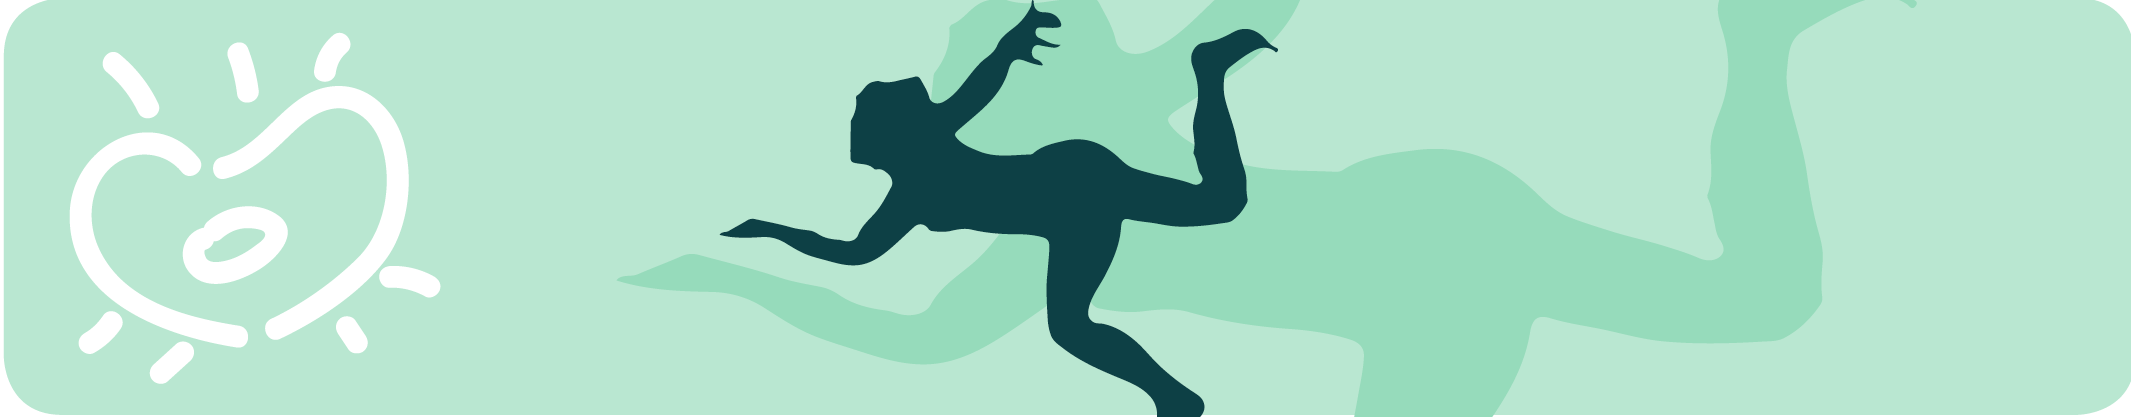 Continuum Movement - illustration med ikon